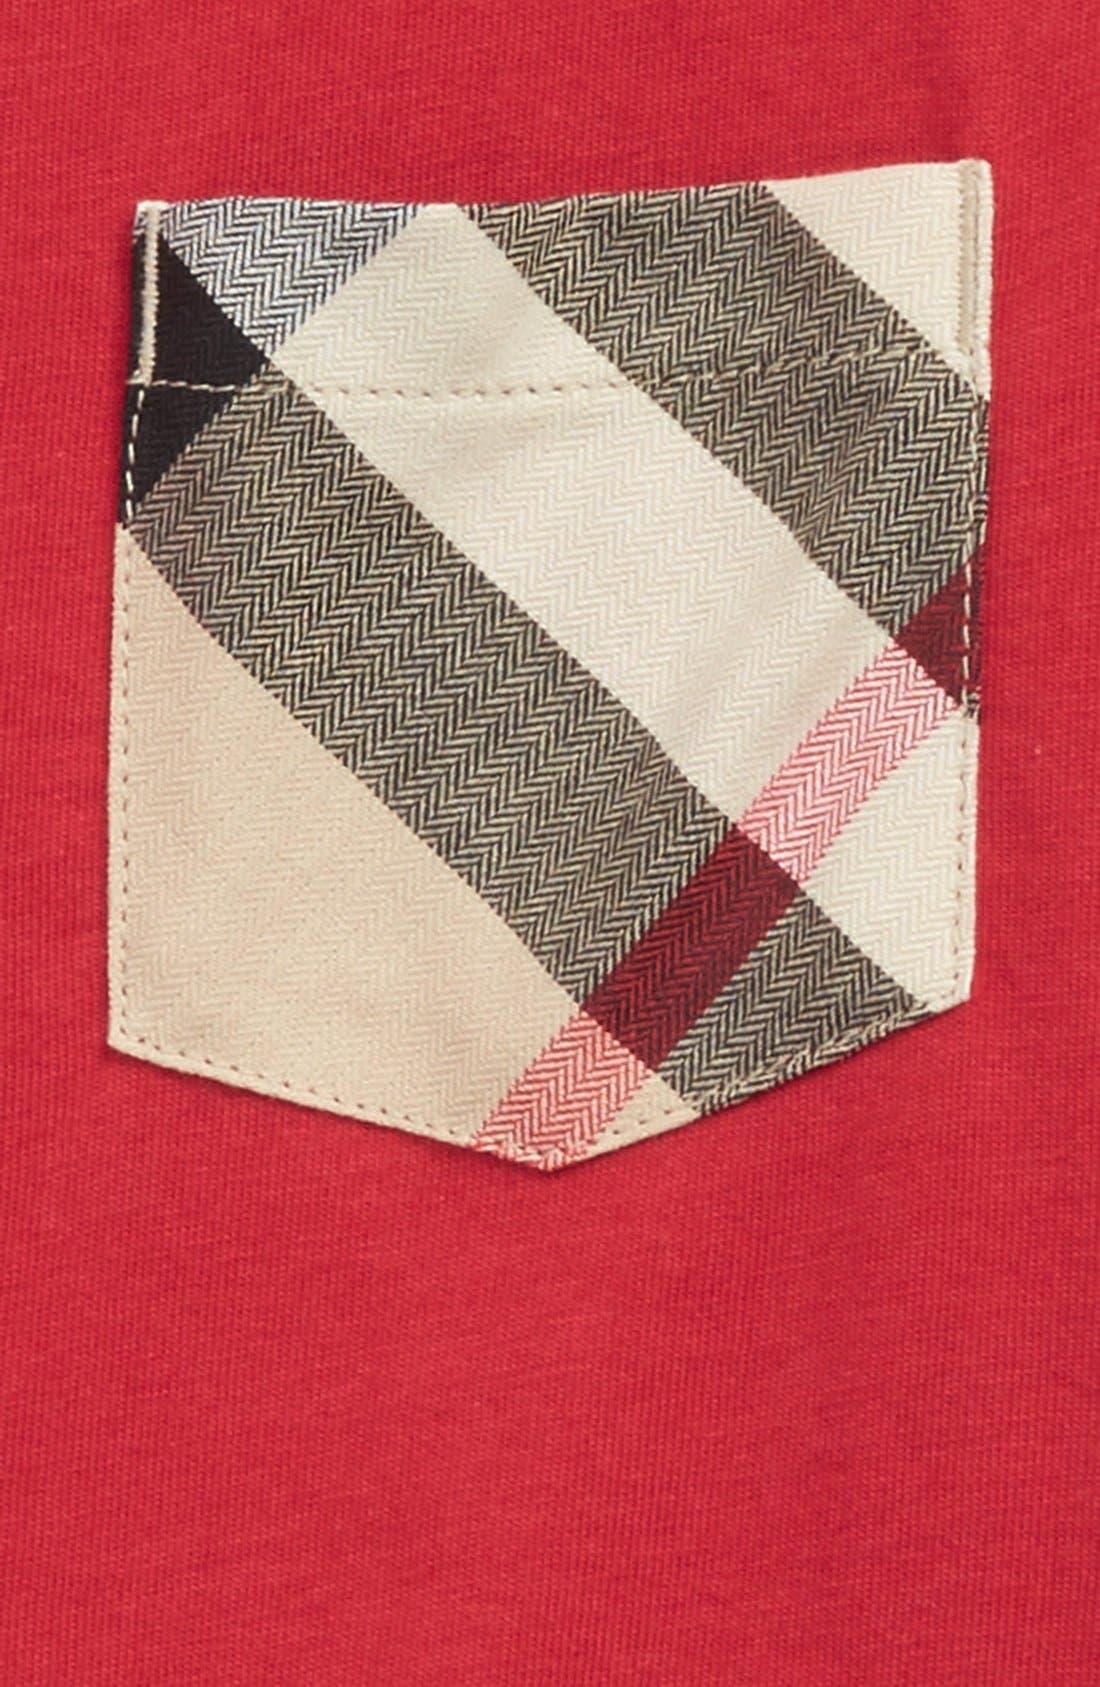 'Callum' Check Print Chest Pocket T-Shirt,                             Alternate thumbnail 2, color,                             Military Red